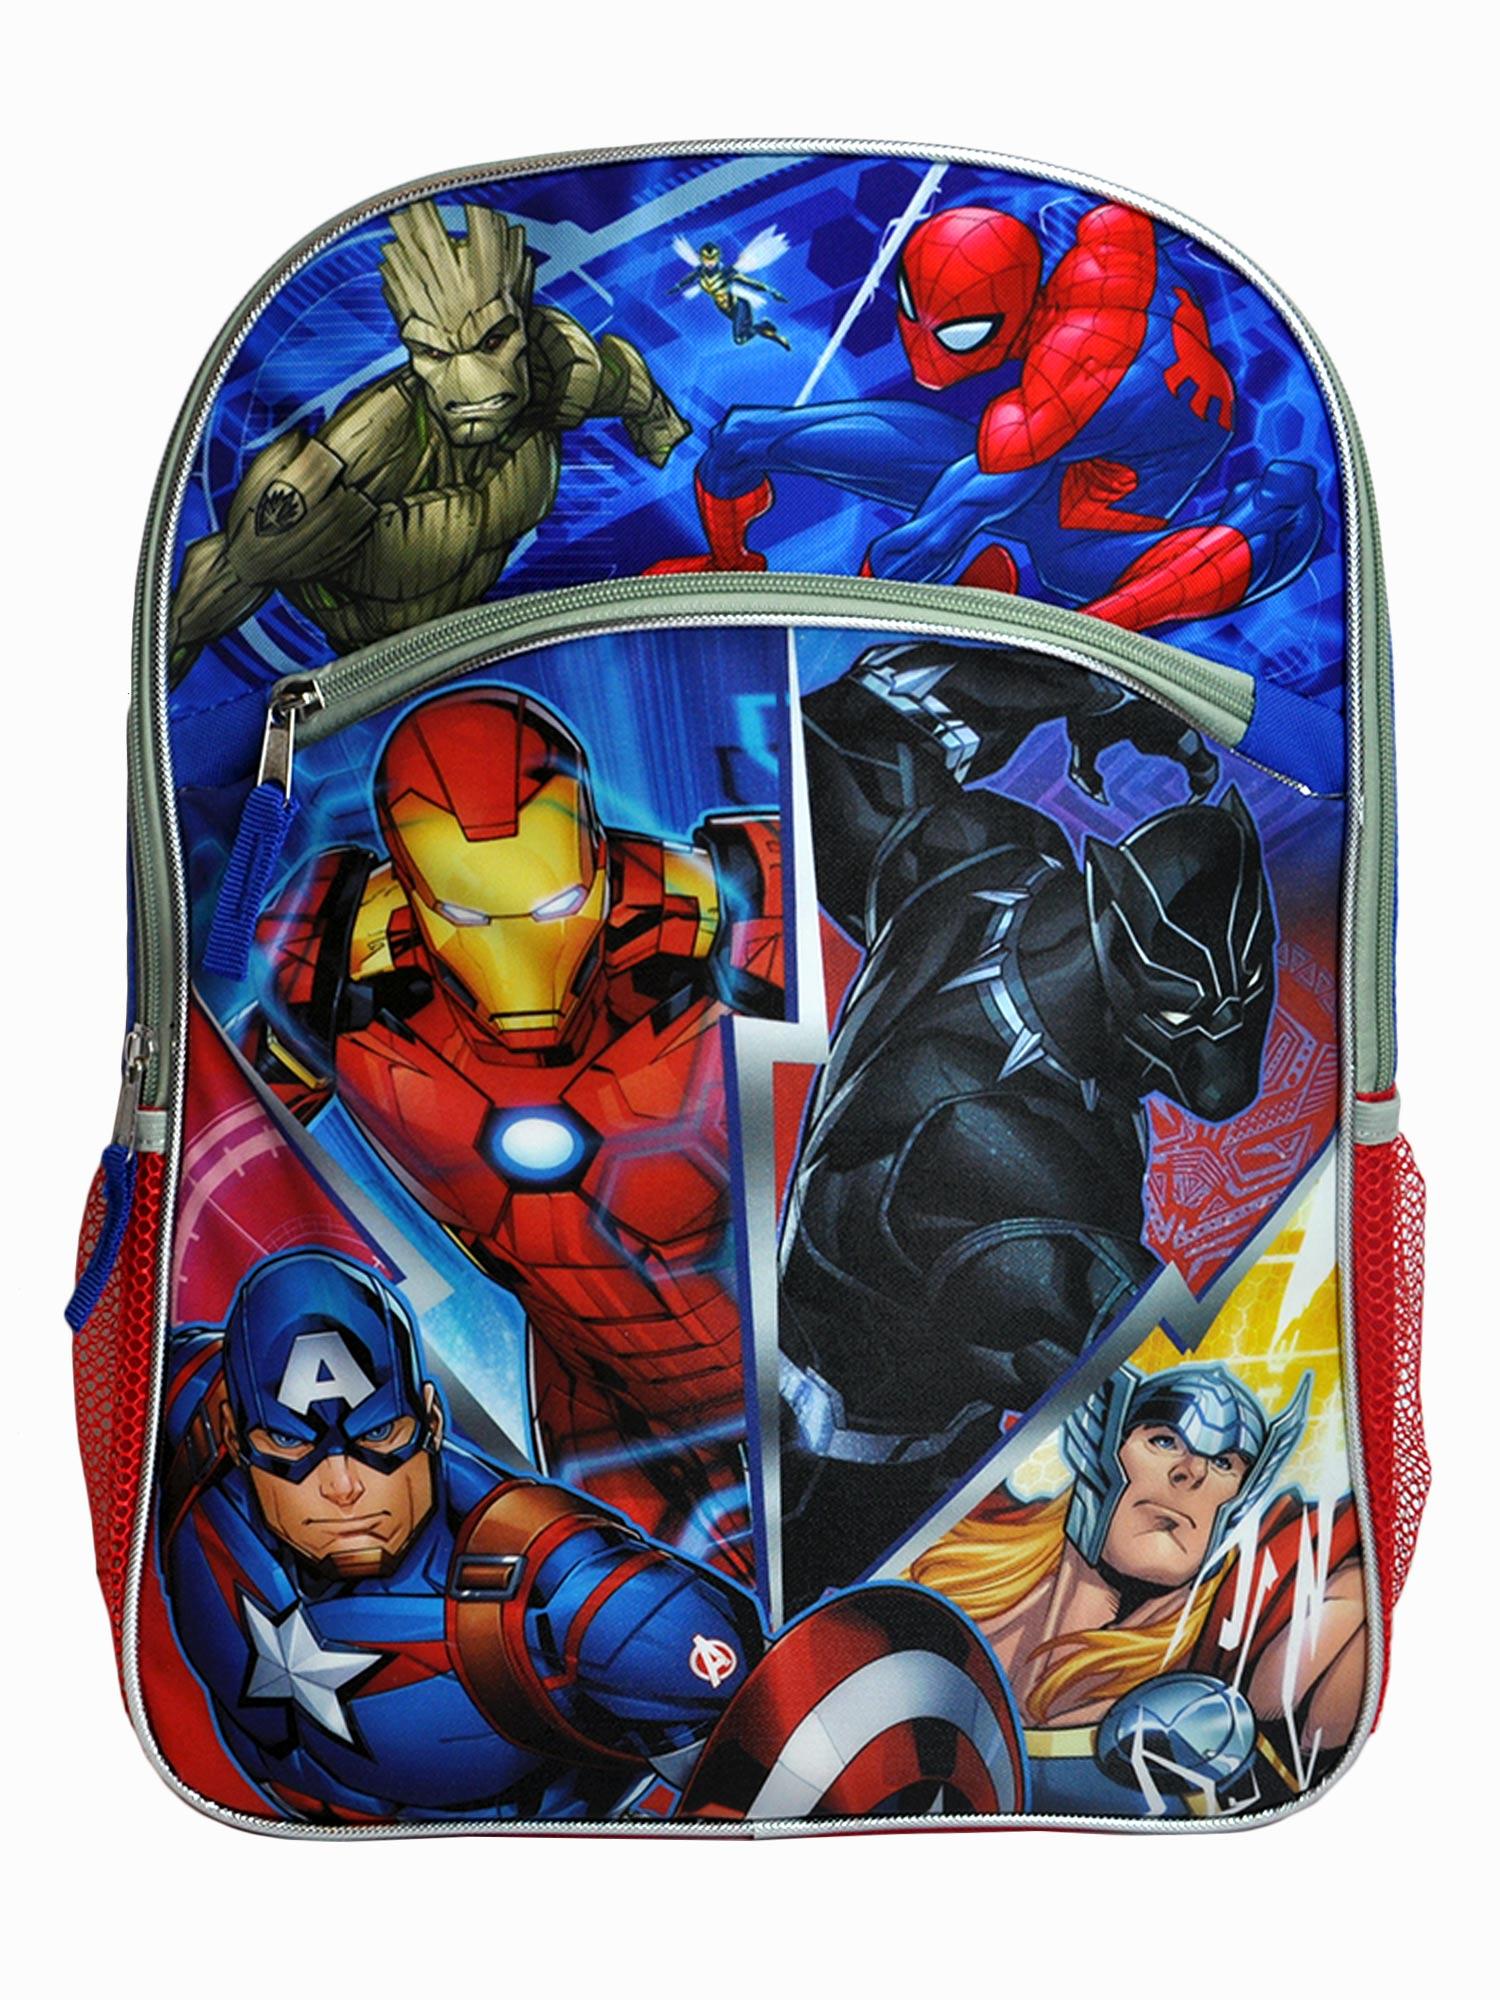 Handle Cover Hand Brake Iron Man The Avengers Car Accessory Side Brake